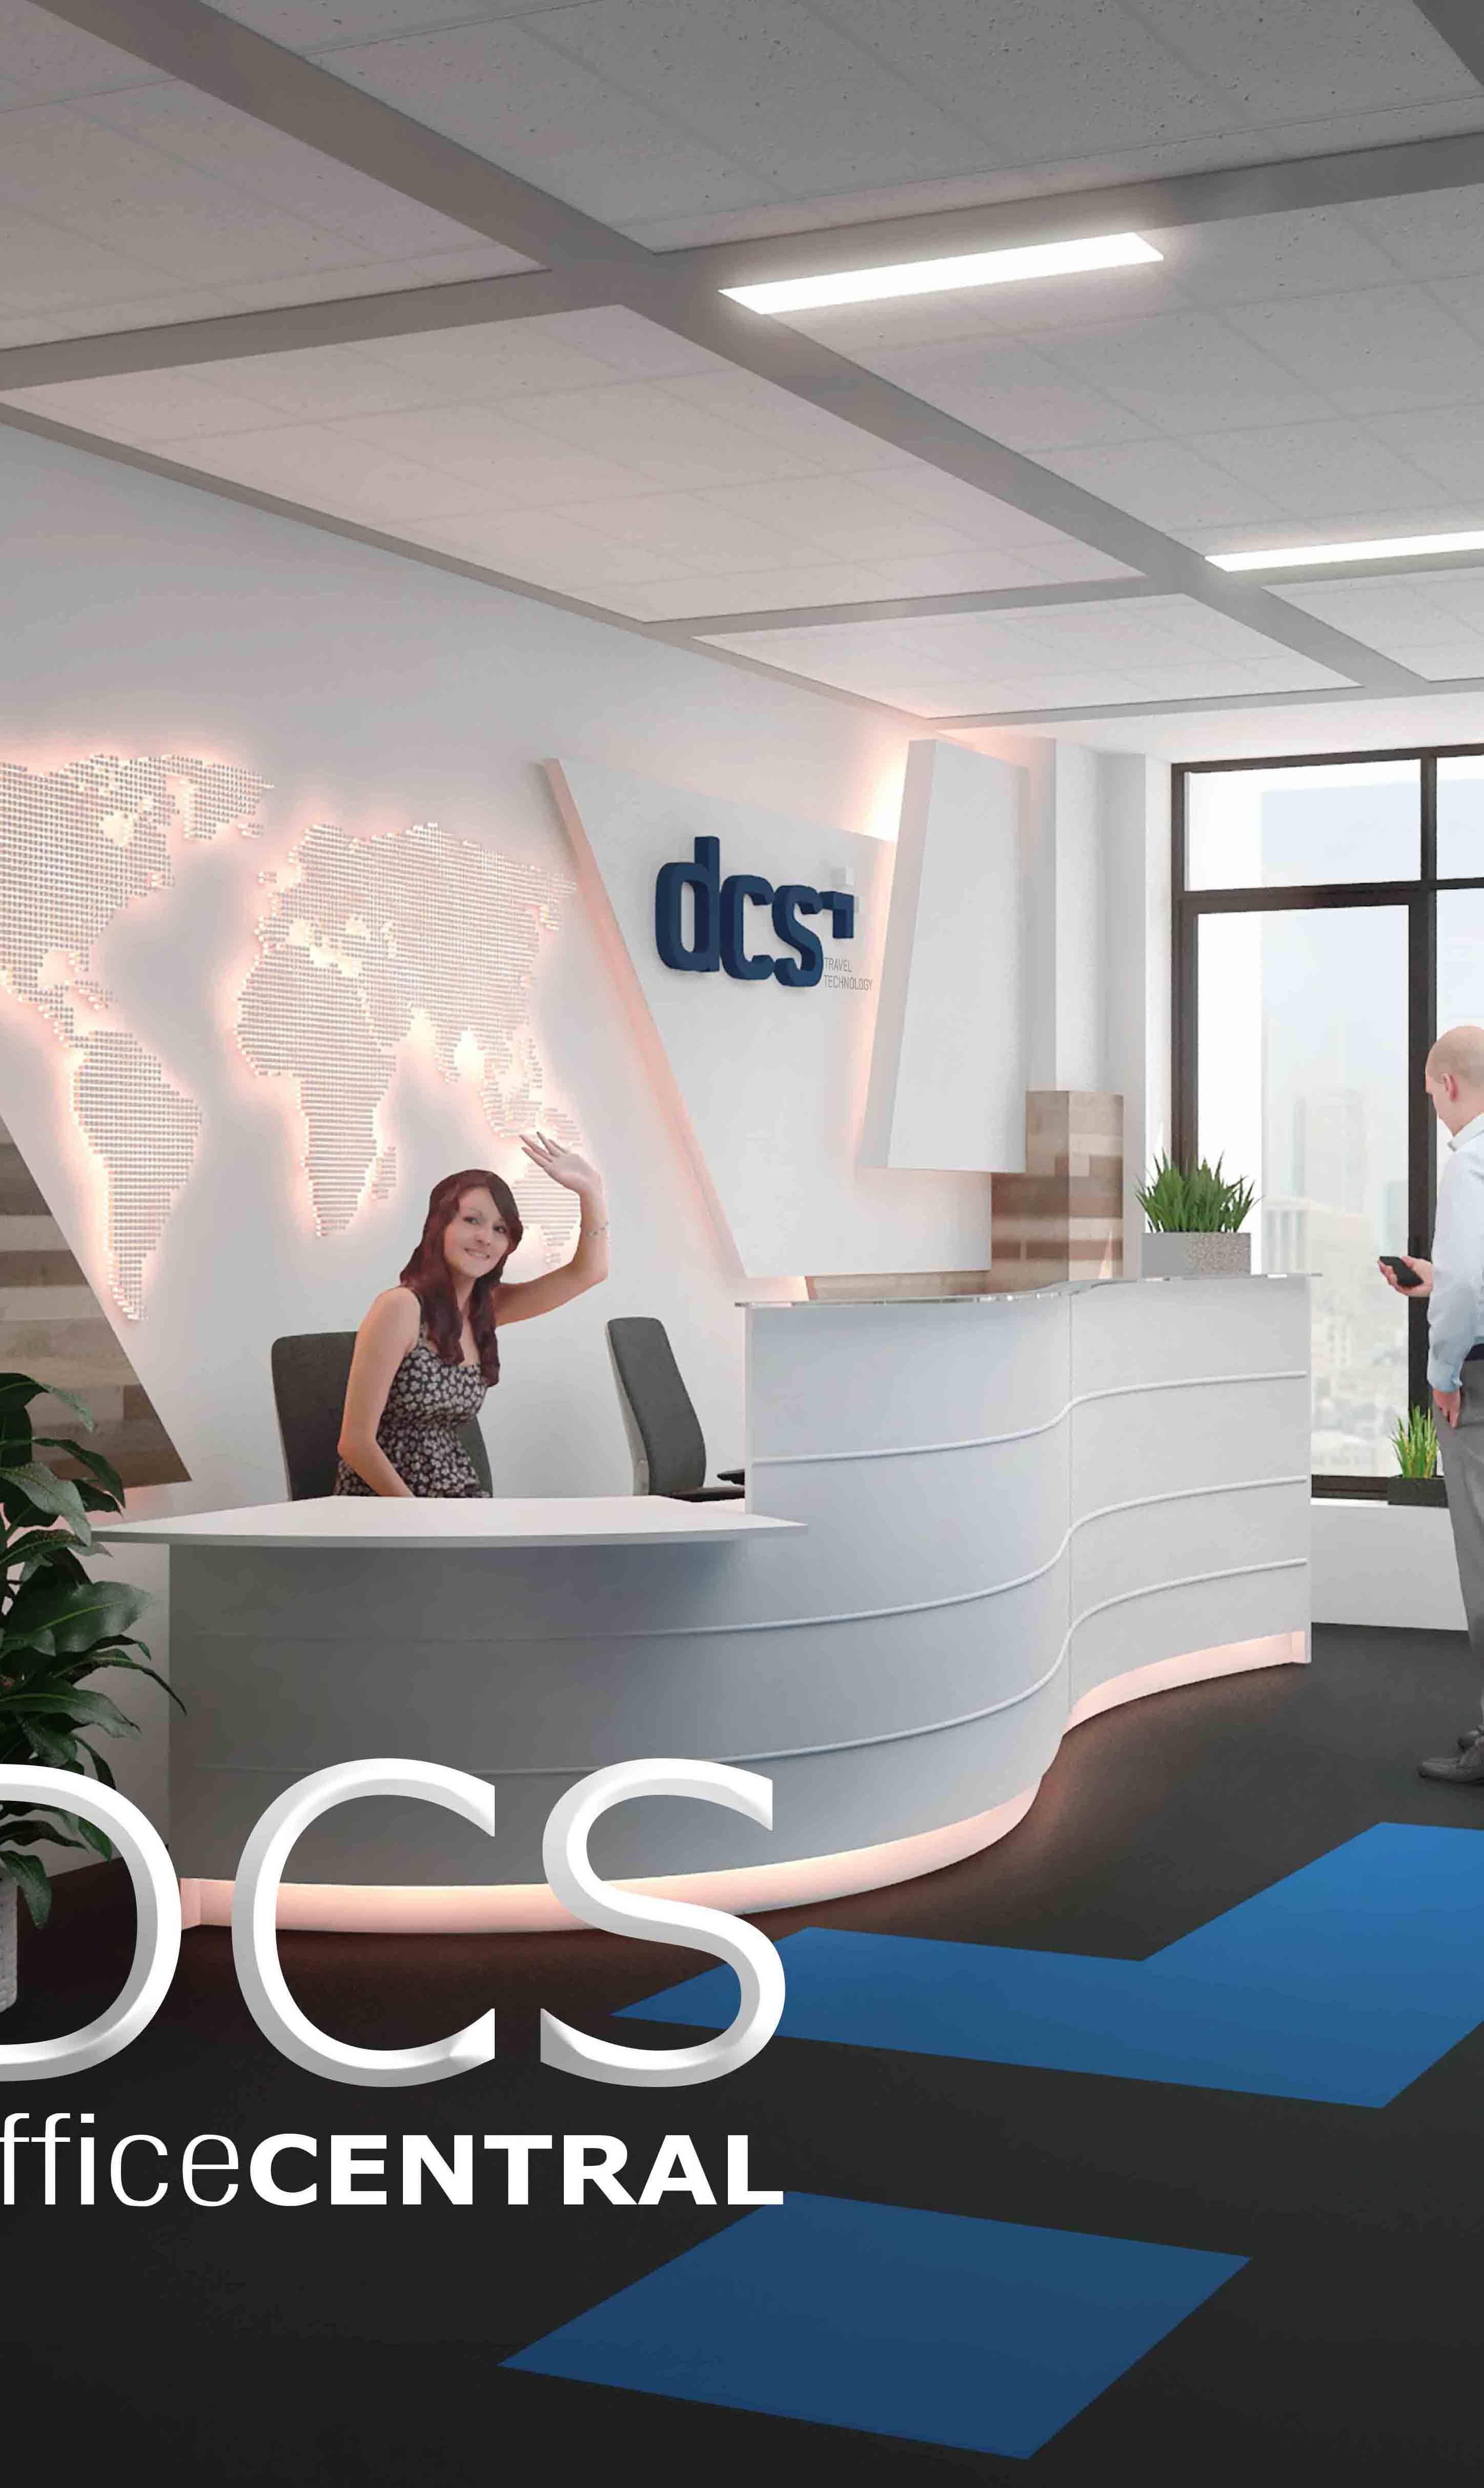 DCS Office